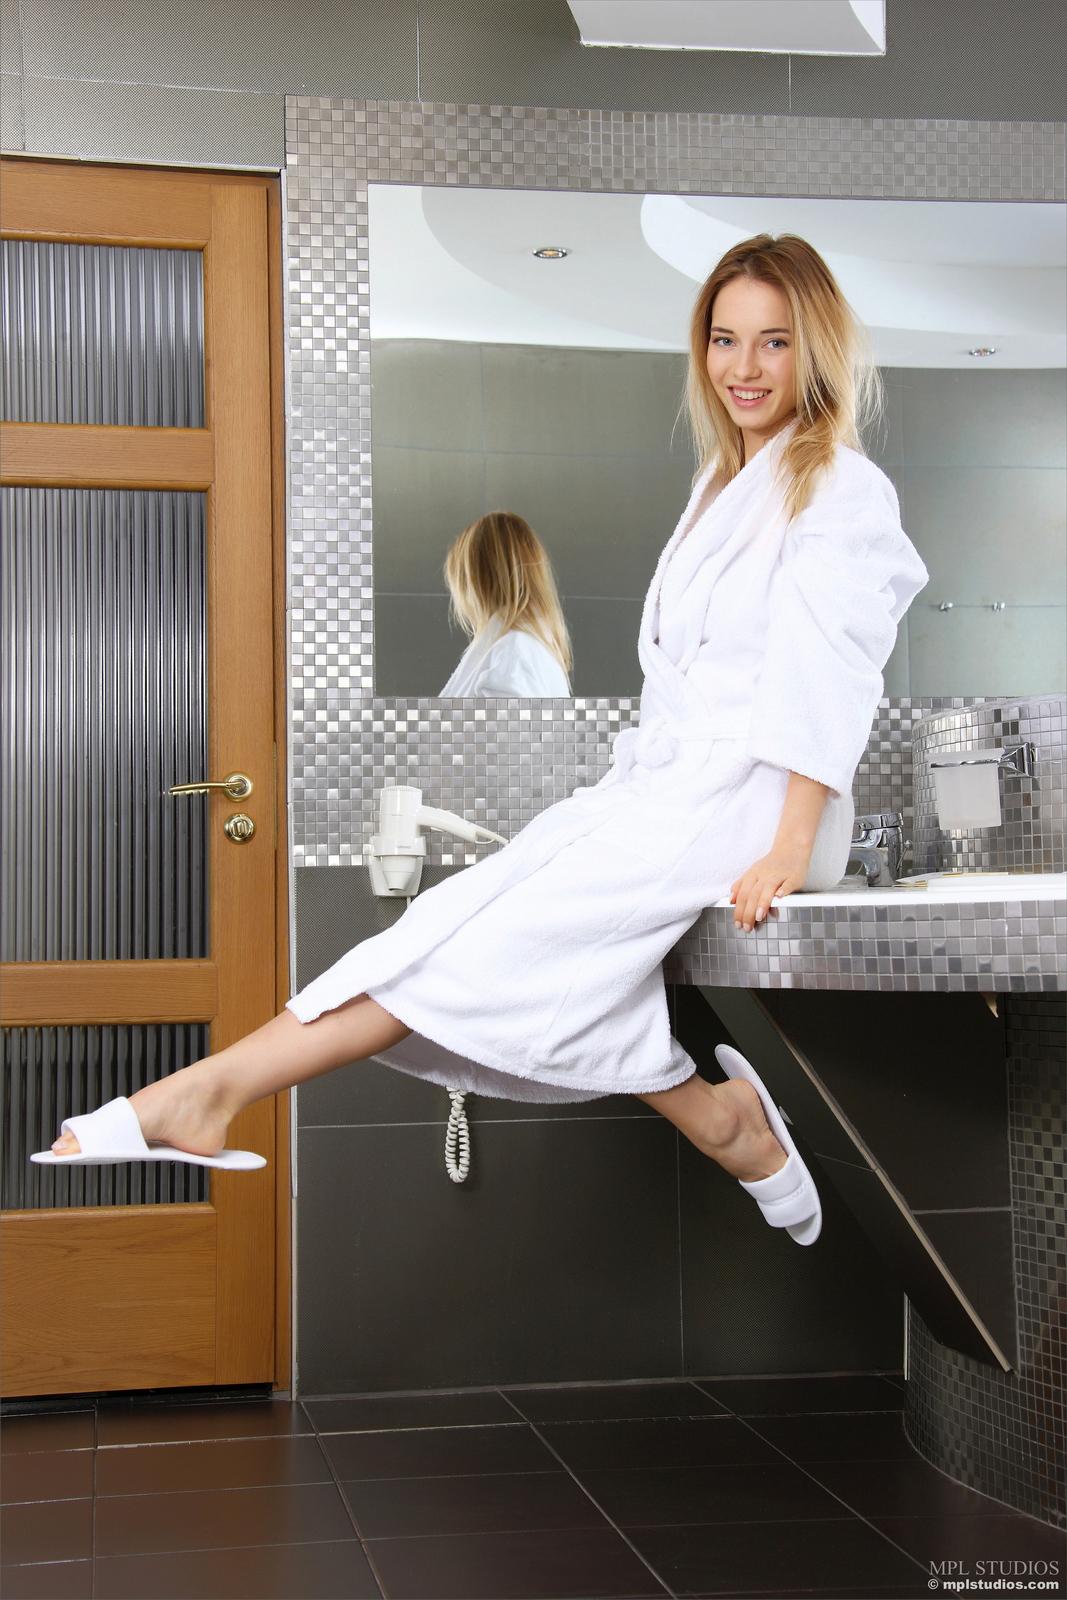 danica-bathroom-blonde-dressing-gown-naked-mplstudios-02